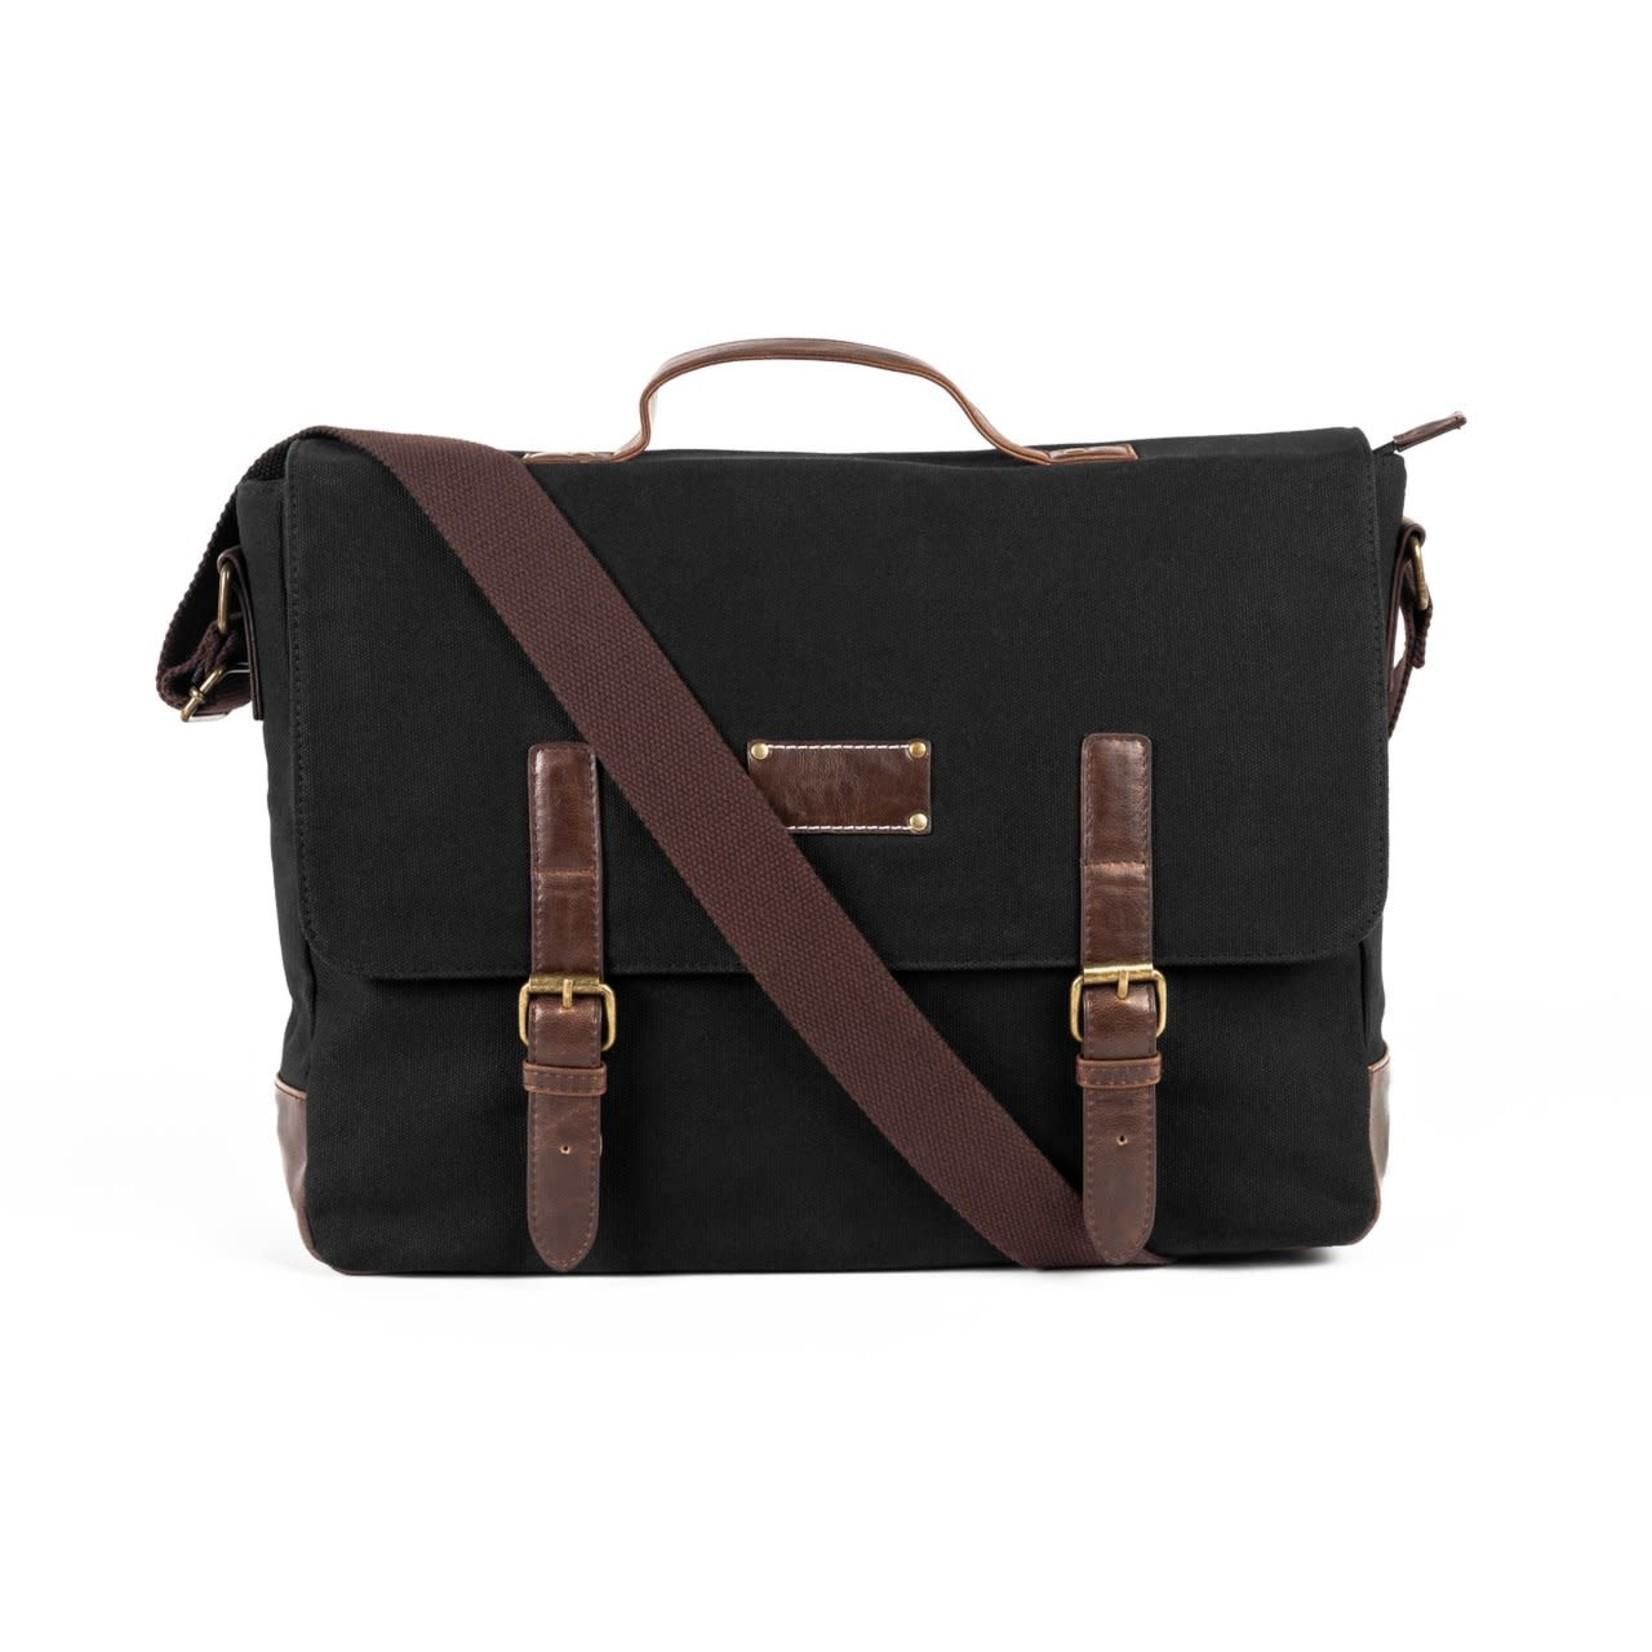 Brouk & Co Ethan Messenger Bag